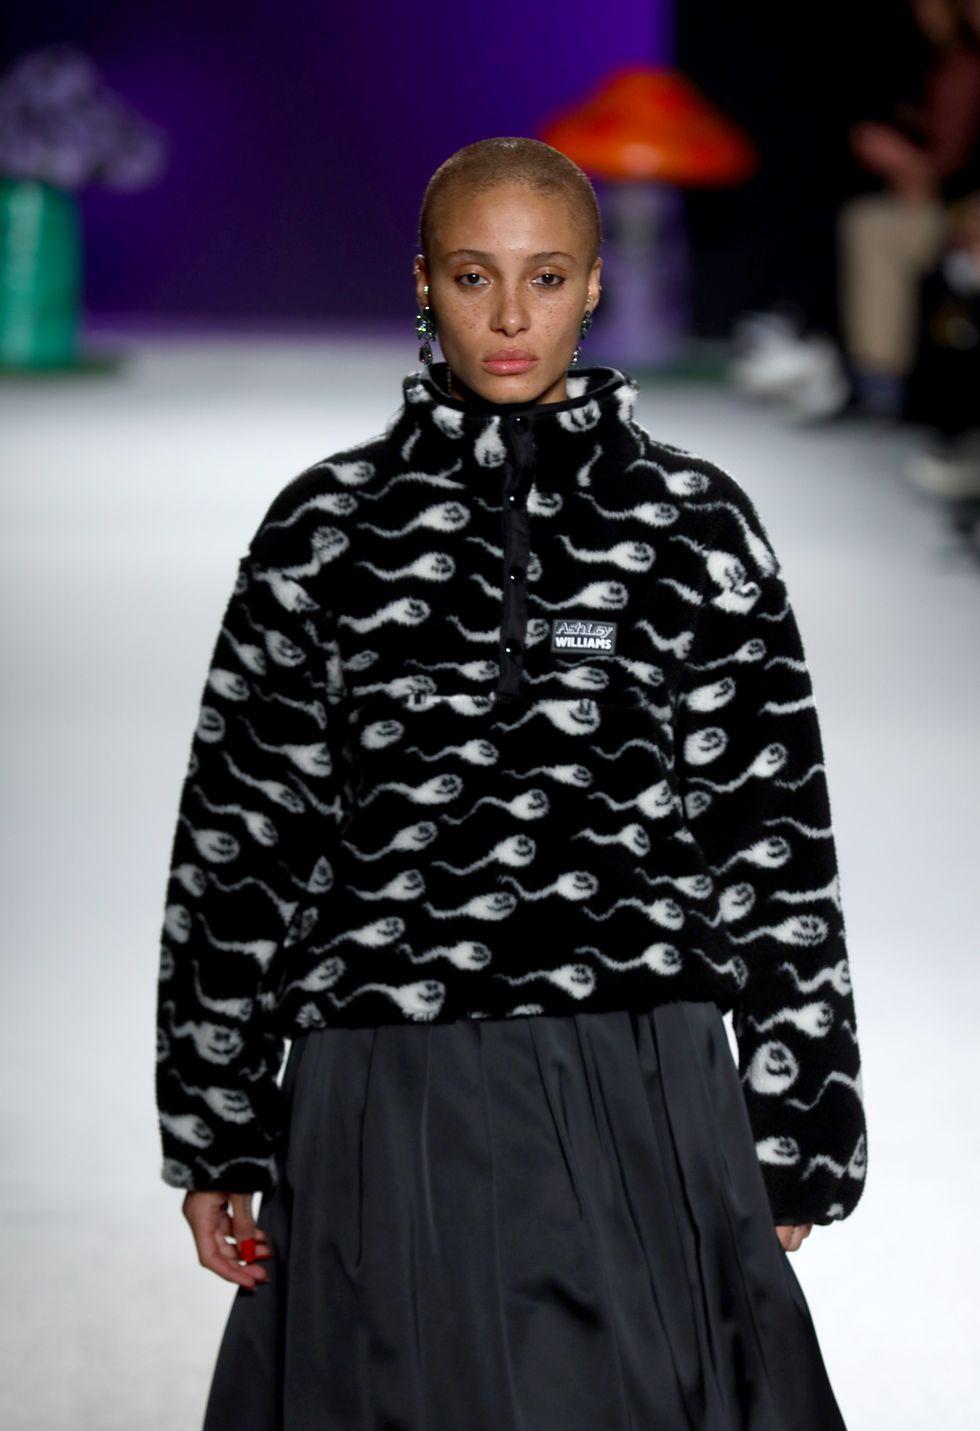 London Fashion Week Opens With a Sperm-Print Fleece